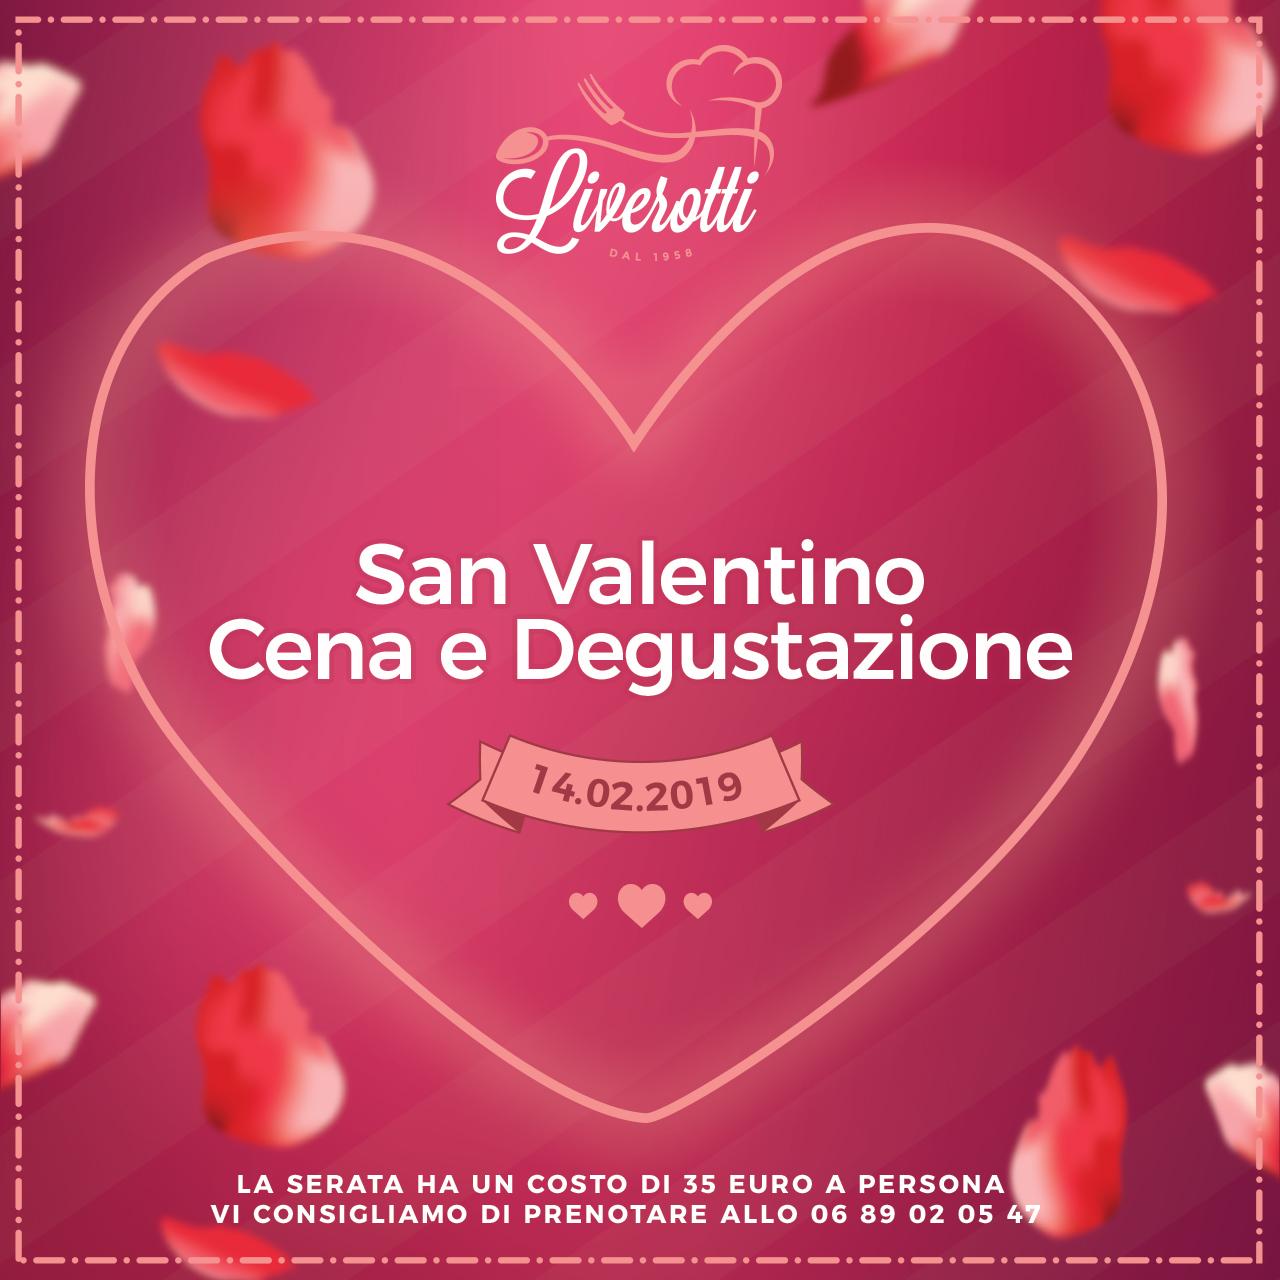 cena-san-valentino-menu (1)